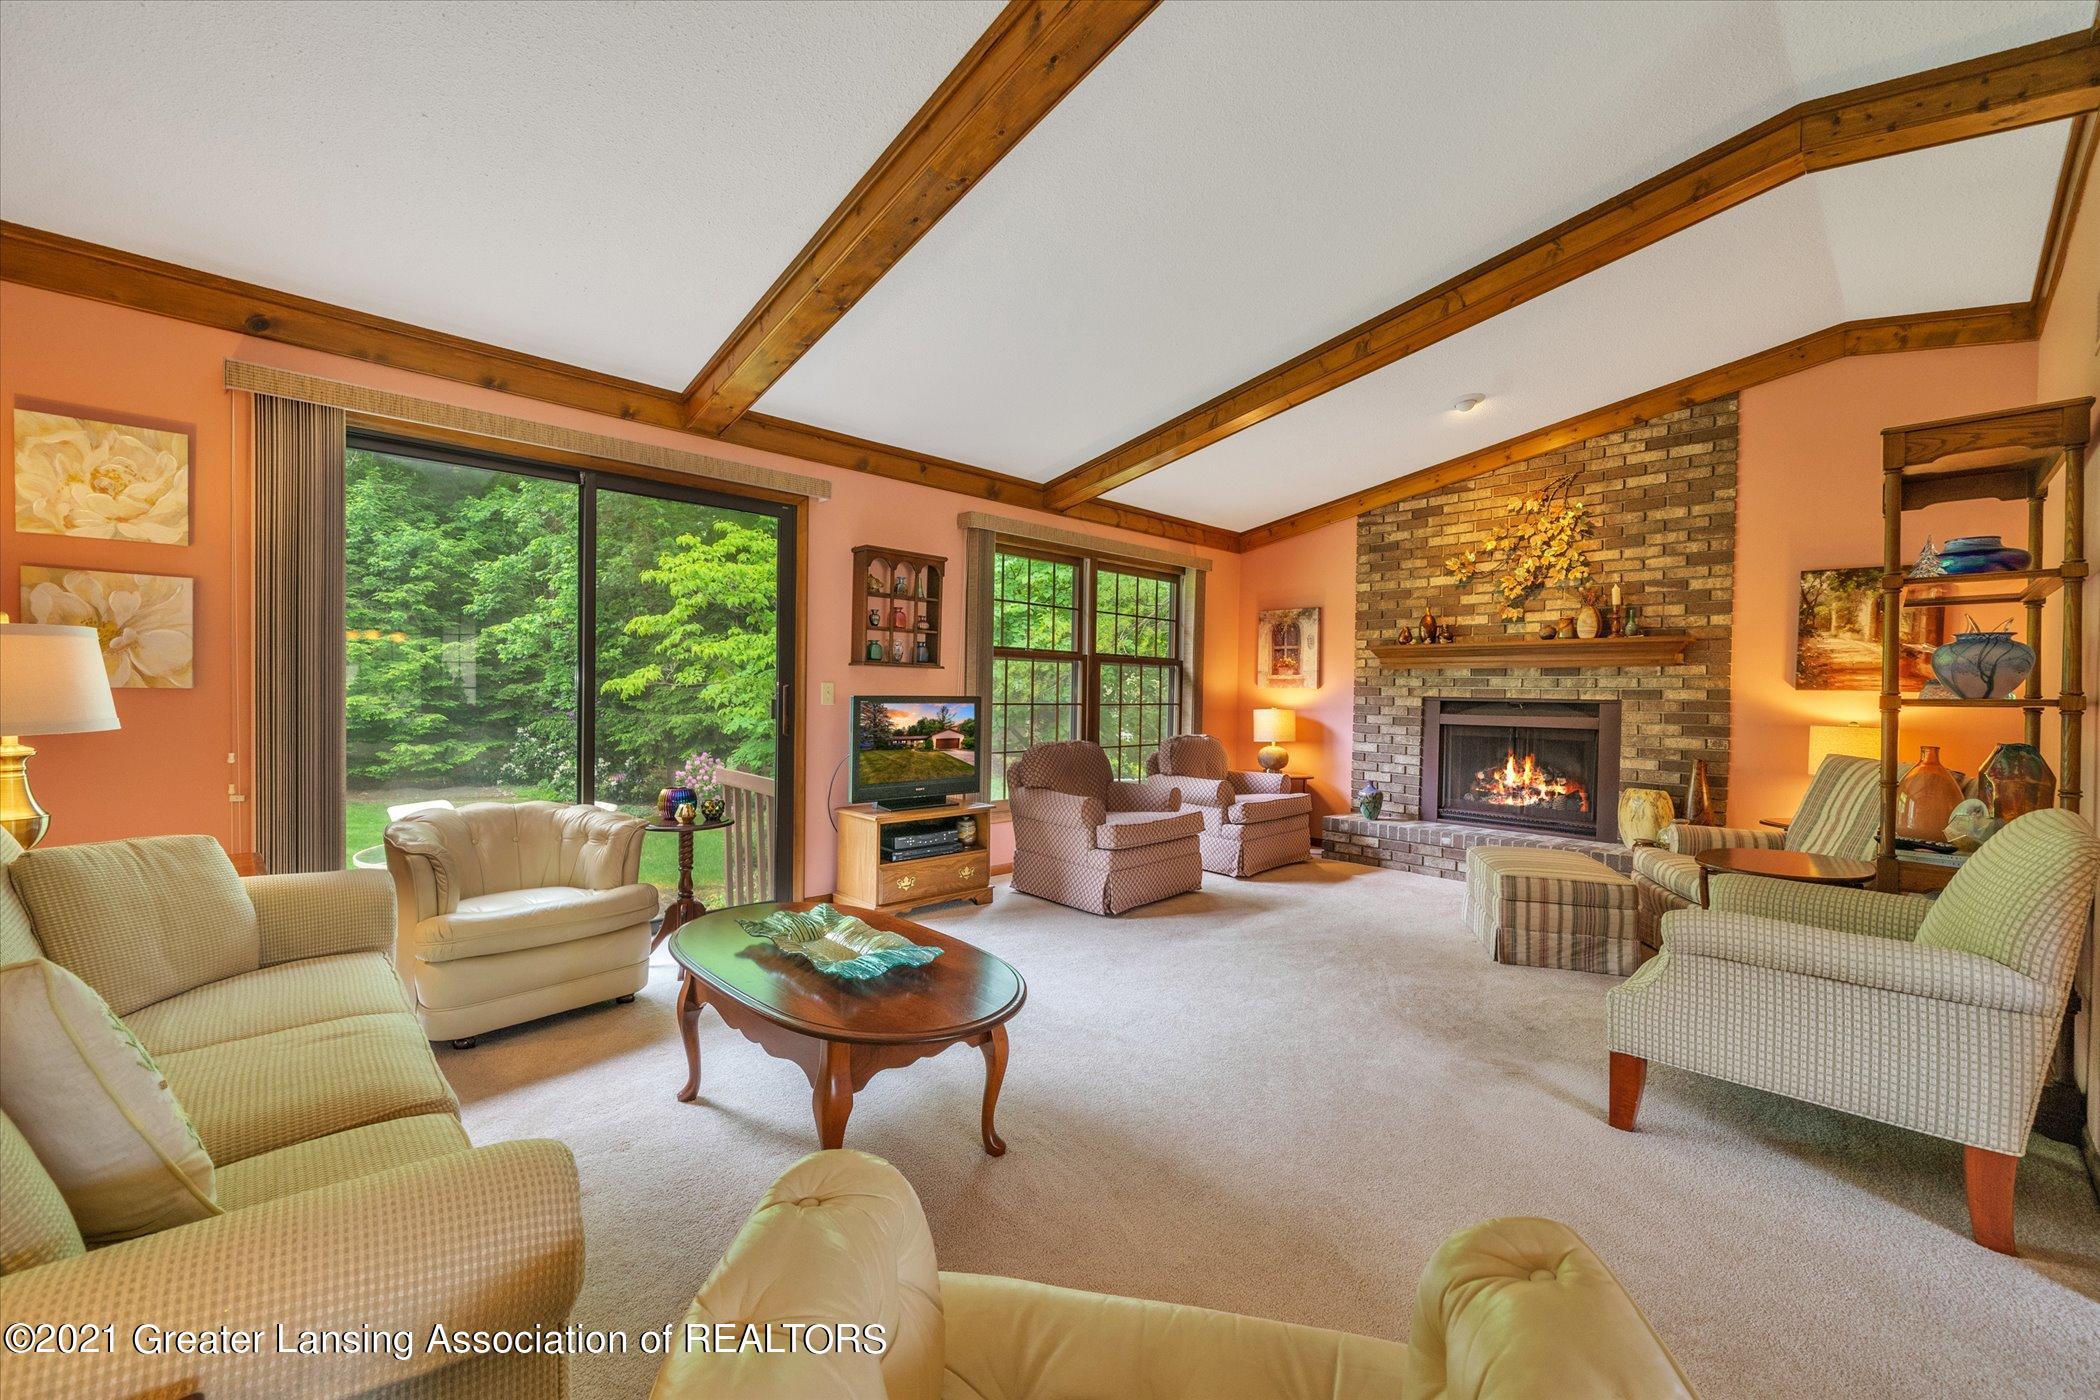 5556 Wood Valley Dr - (4) MAIN FLOOR Living Room - 4